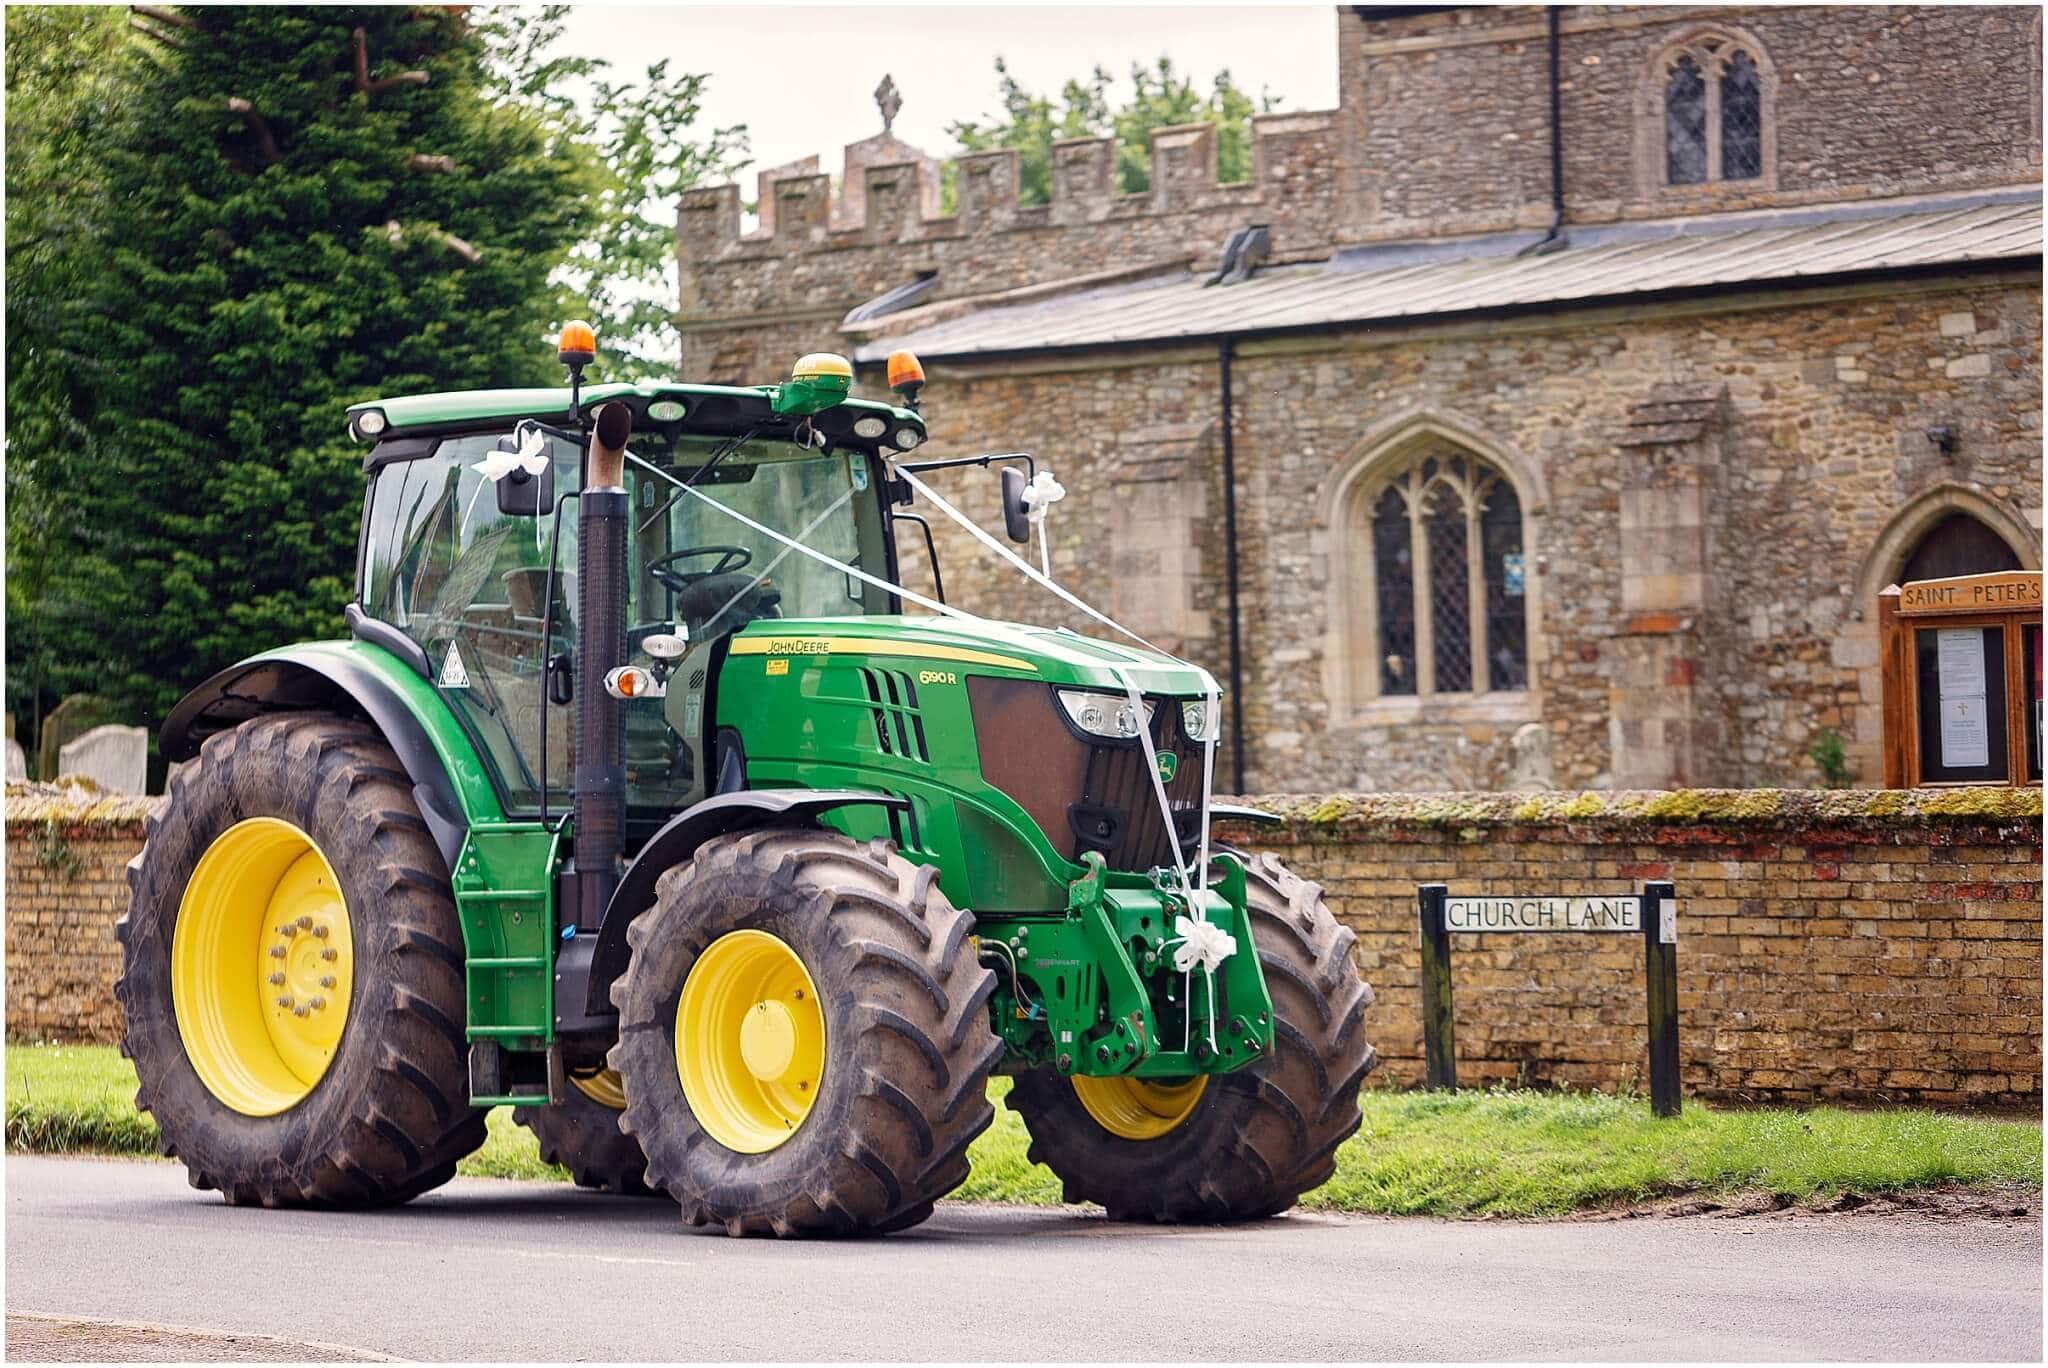 Wedding tractor transport